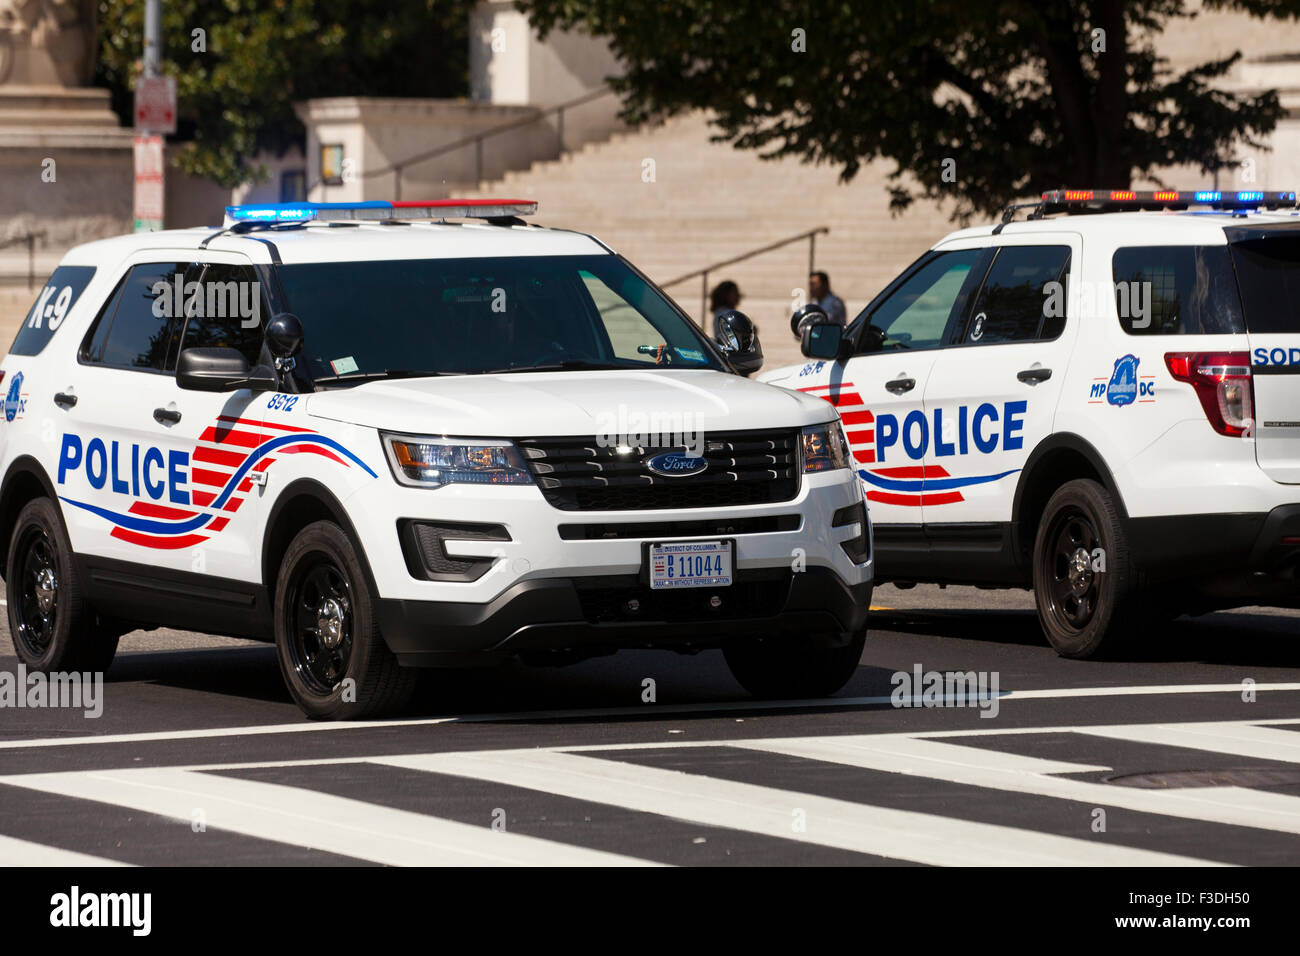 MPD SUV cruisers blocking city street - Washington, DC USA - Stock Image